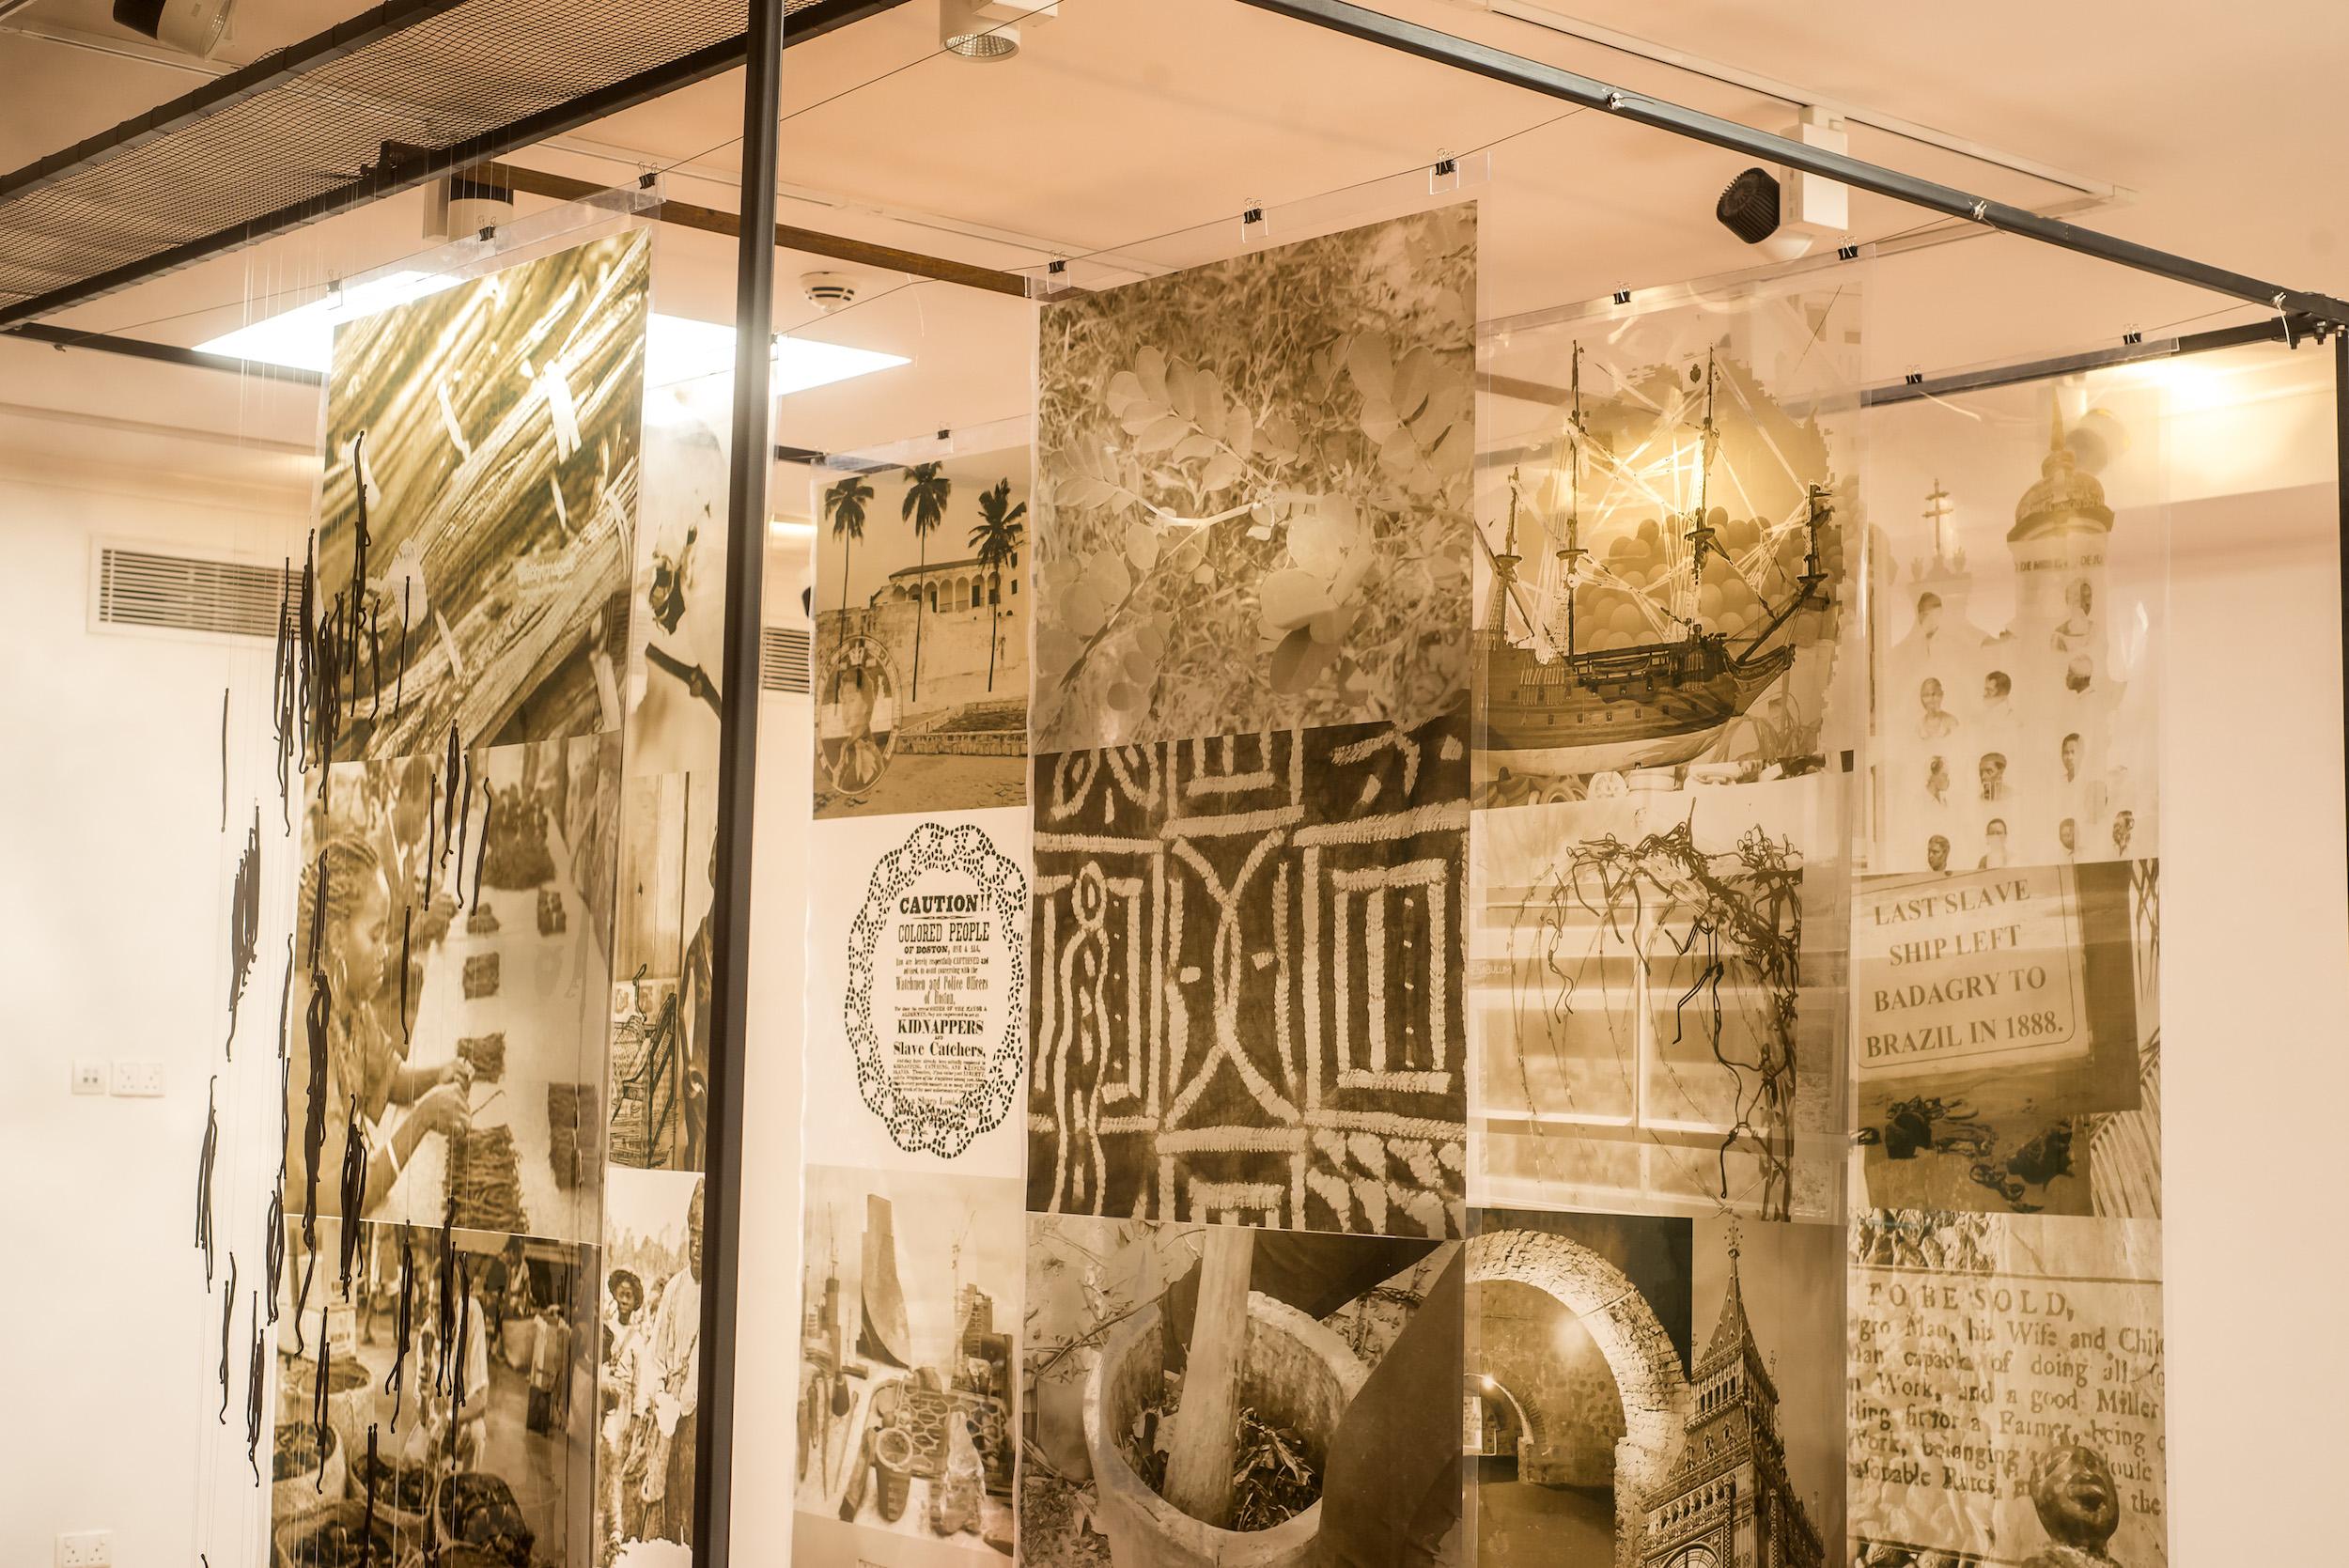 Ndidi Dike's exhibition in Lagos